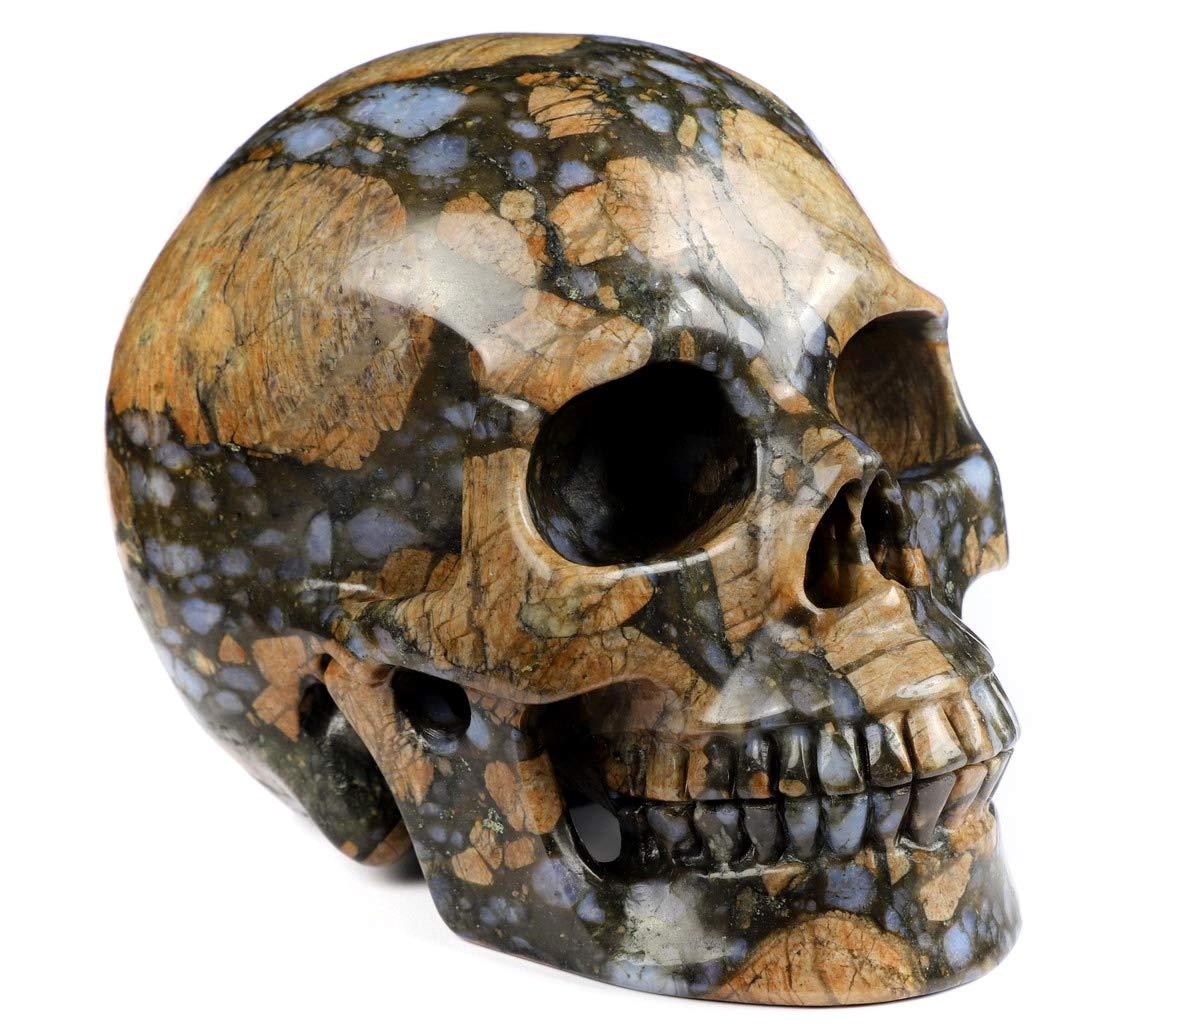 Skullis 5.0 Que Sera Stone Crystal Skull, Hand Carved Gemstone Fine Art Sculpture, Reiki Healing Stone Statue.